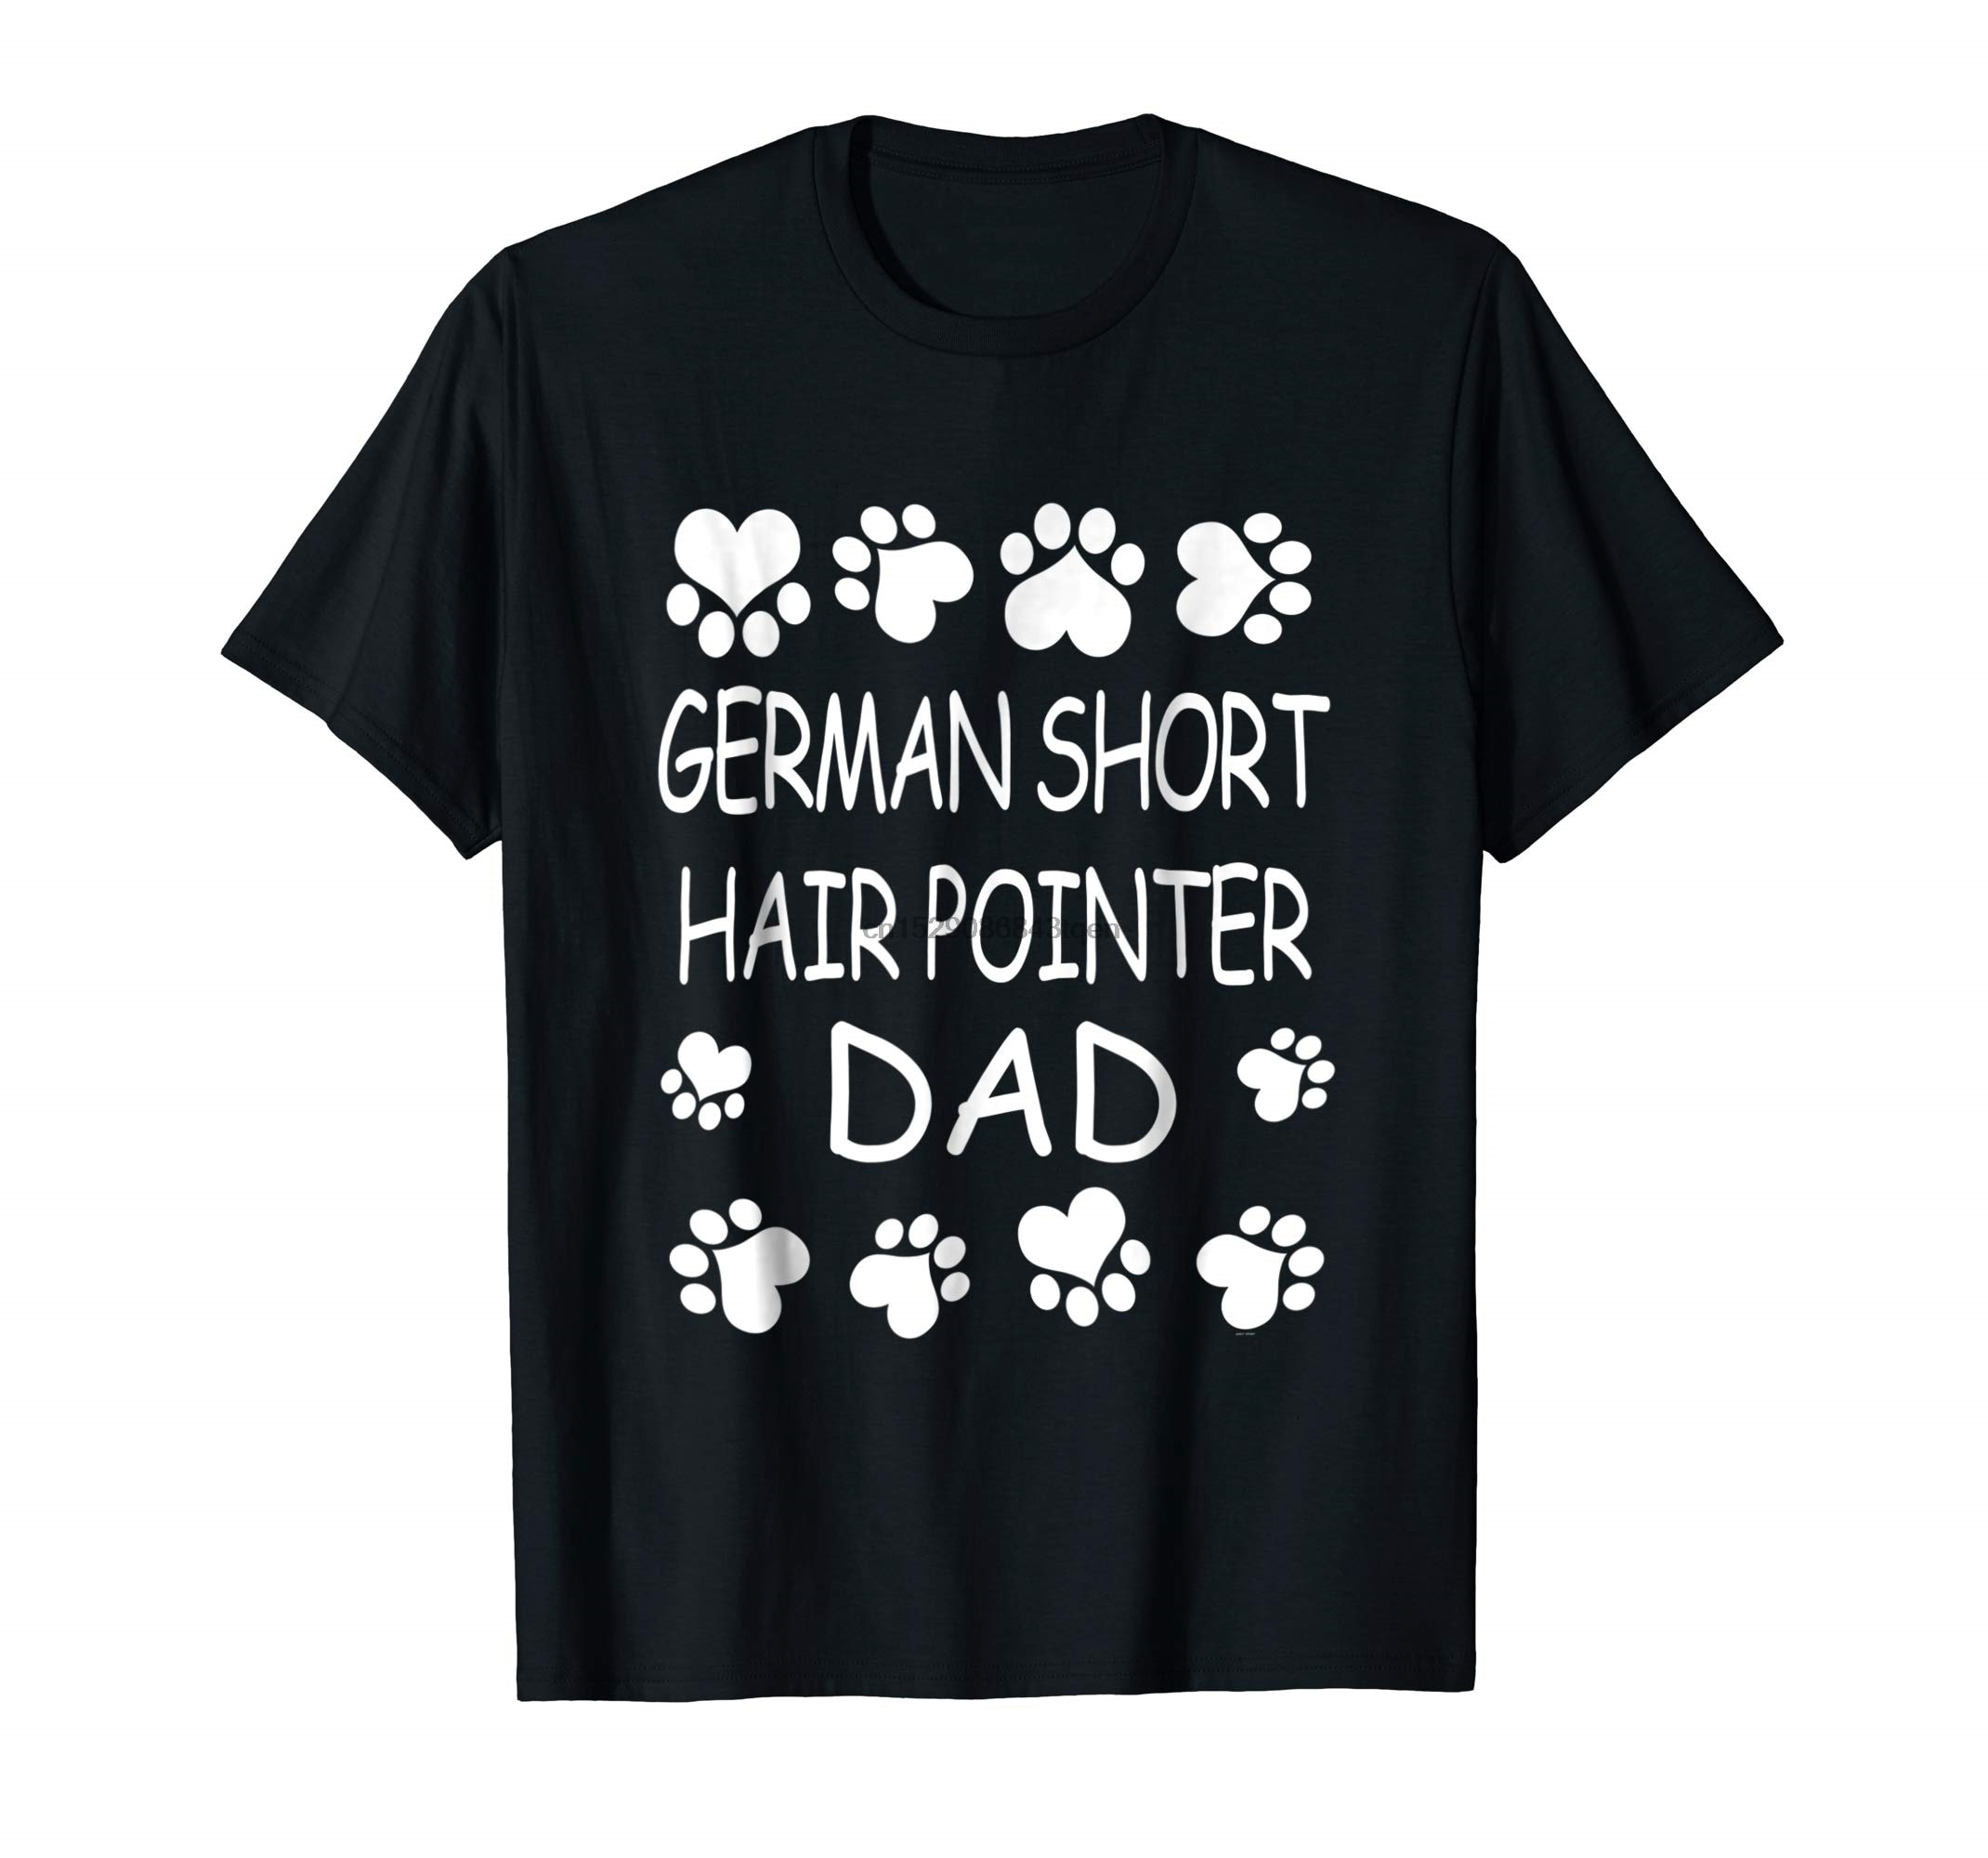 German Short Hair Pointer Dad lover Christmas gift tee shirt-Men's T-Shirt-Black